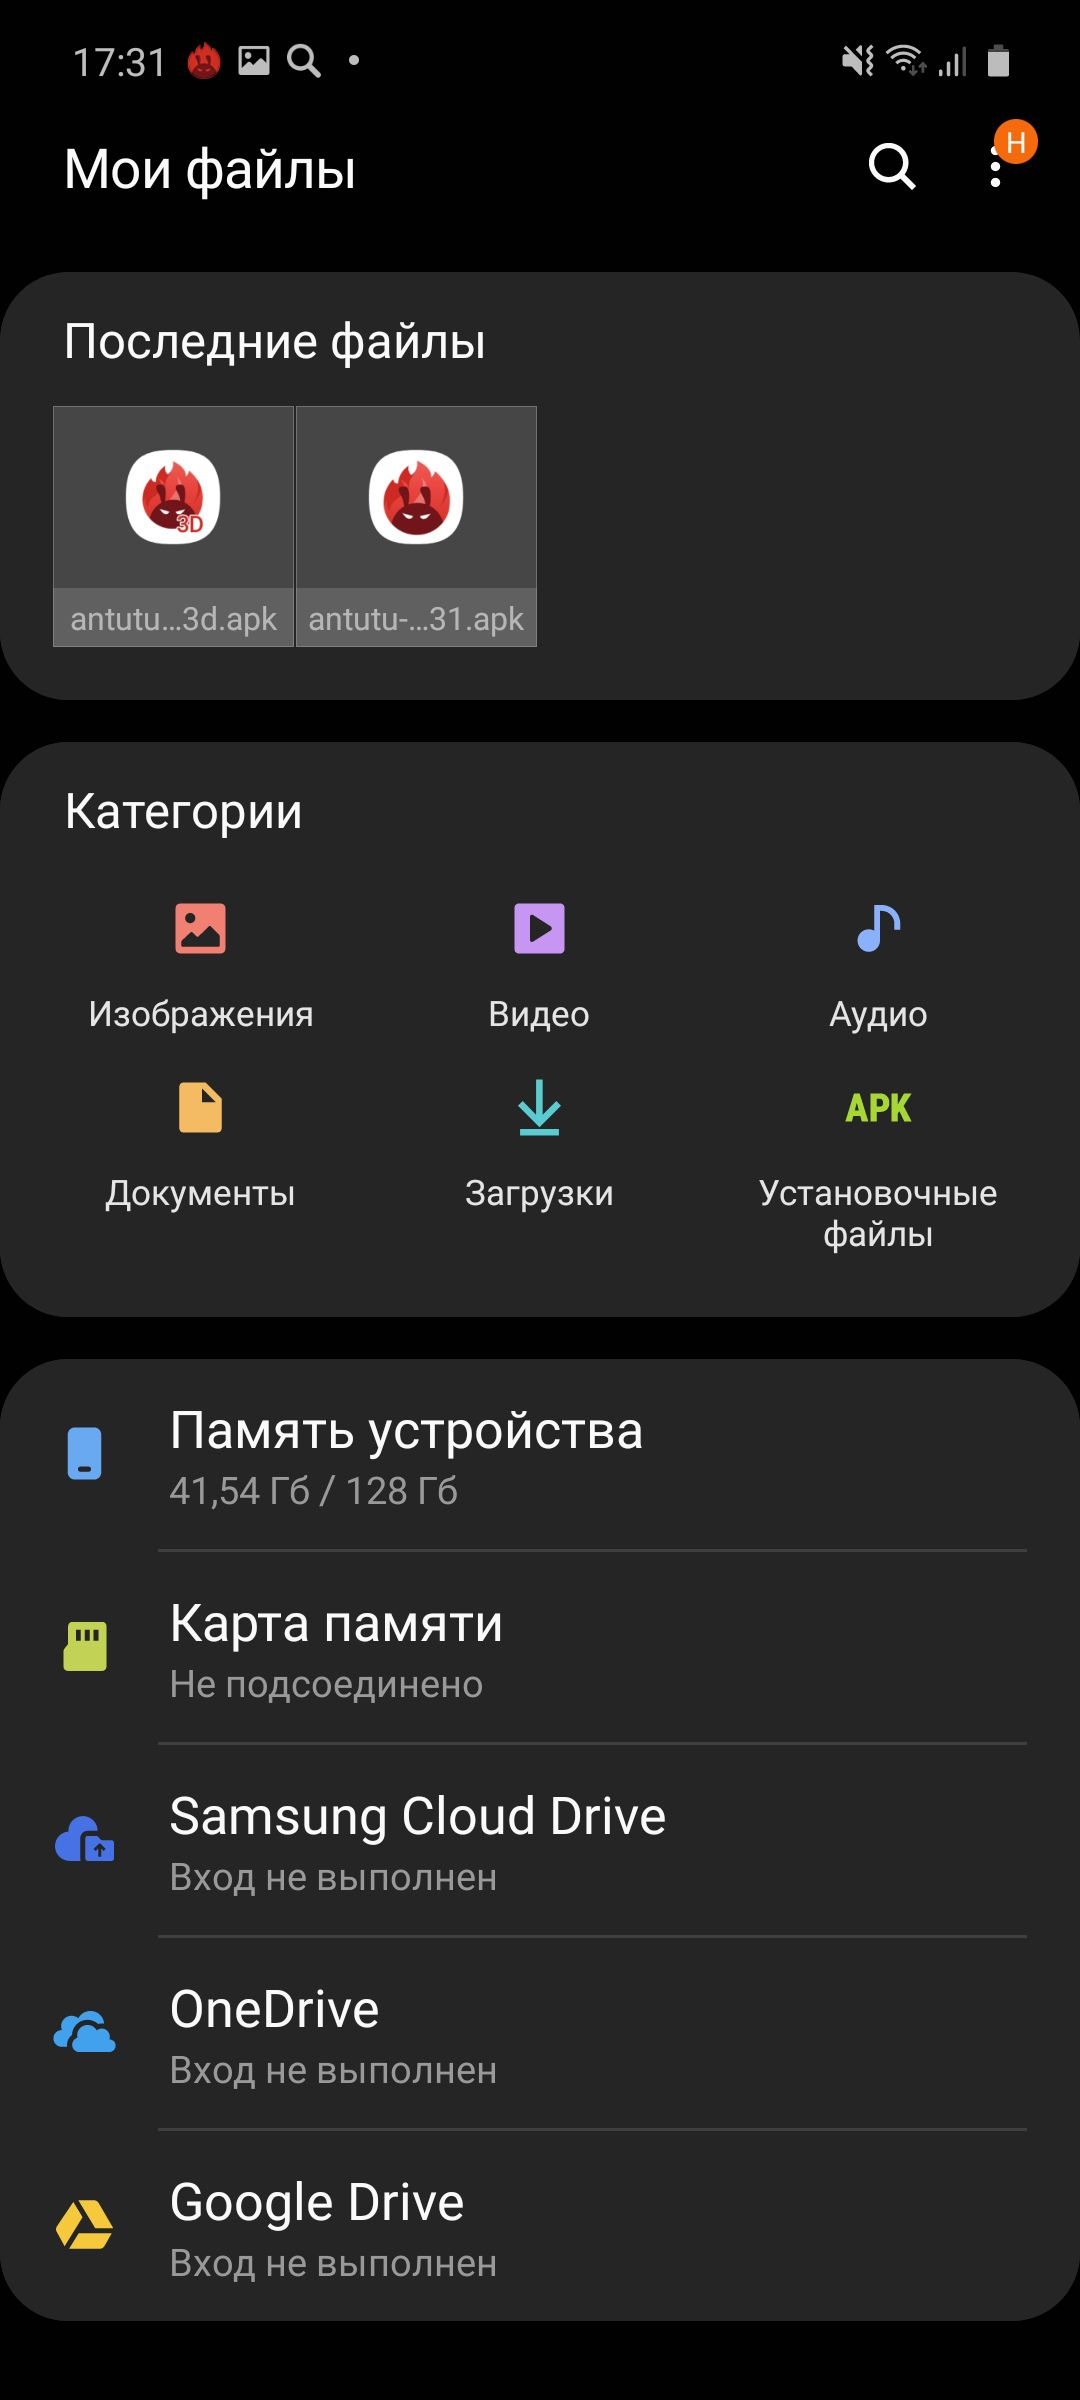 Обзор Samsung Galaxy A71: завышенный середнячок Samsung  - obzor_samsung_galaxy_a71_overprajsnutyj_serednak_picture26_9